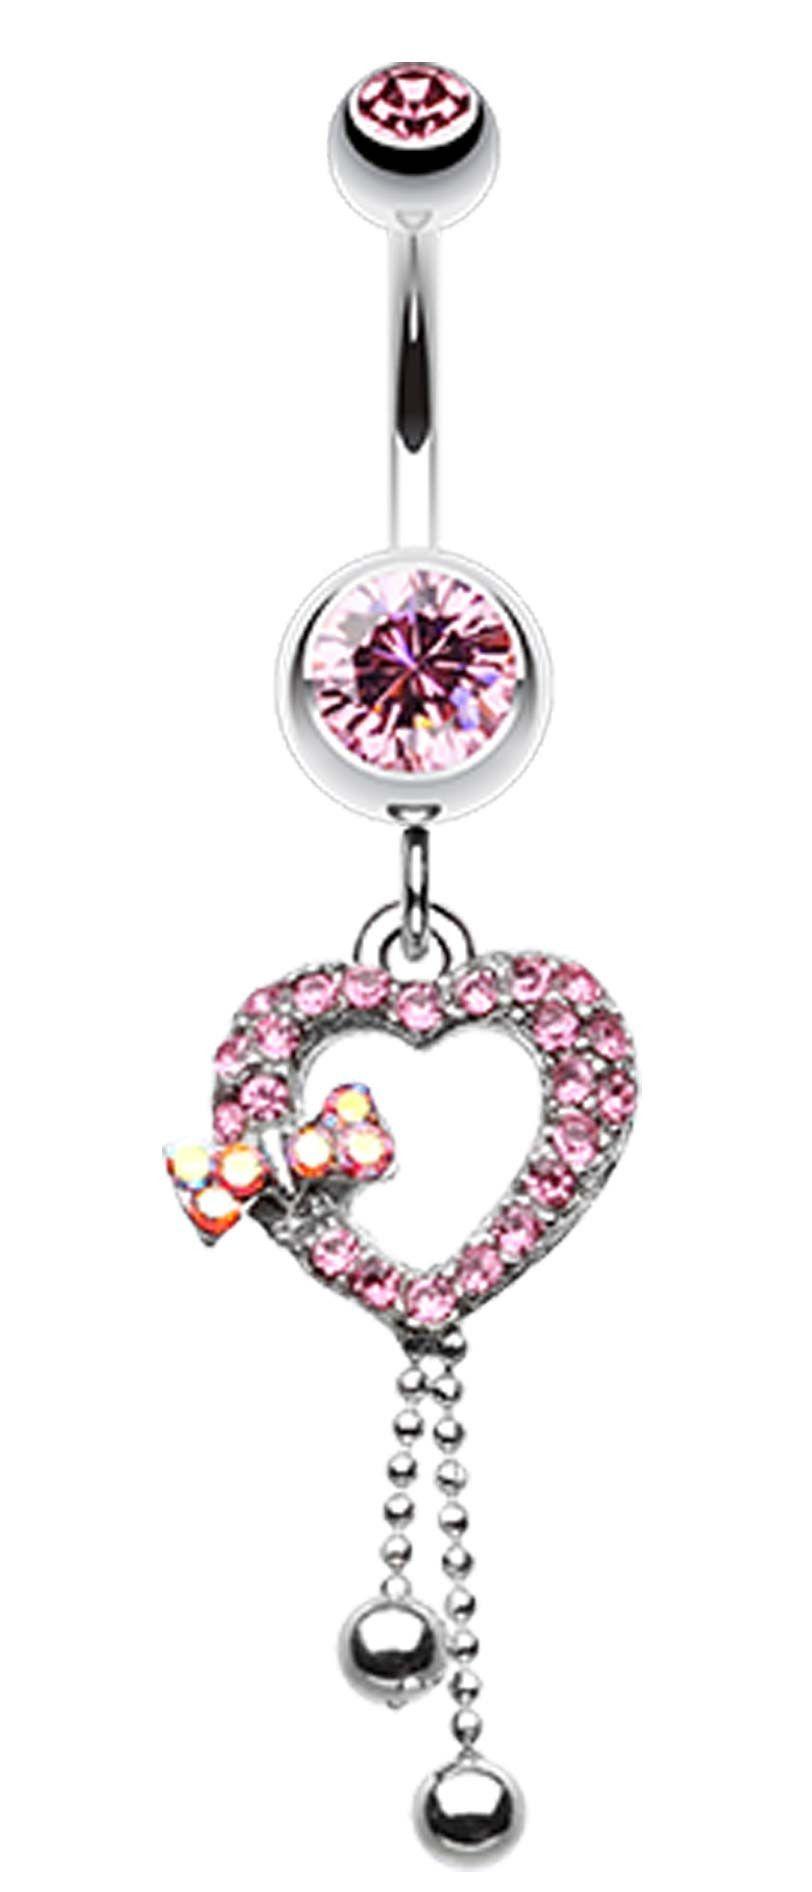 Belly button piercing jewellery  My Dainty Heart Belly Button Ring  Pinterest  Belly button Ring